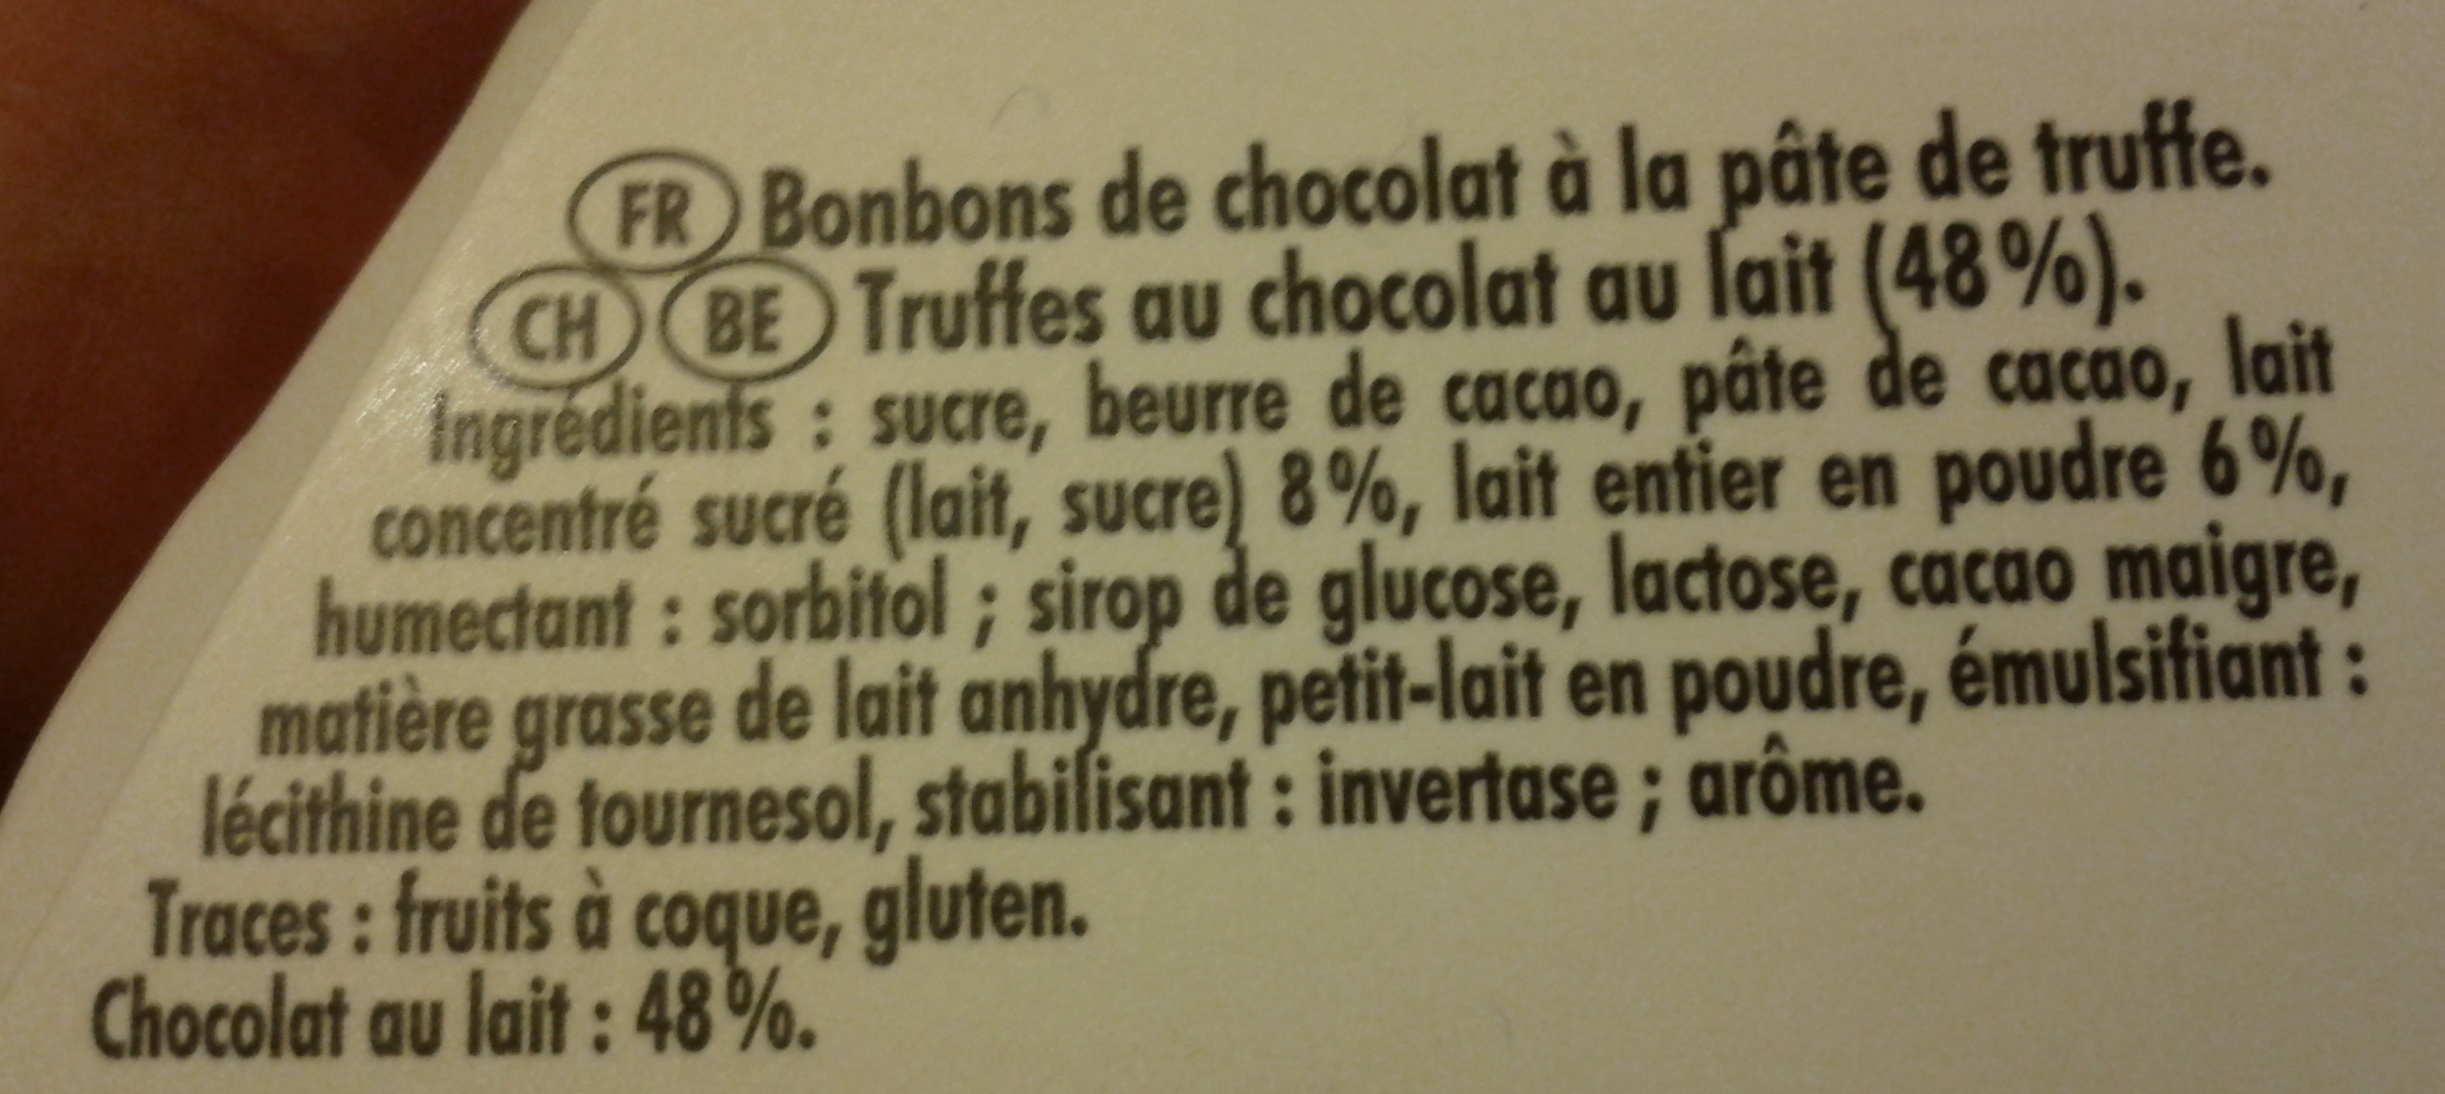 La Truffe LAIT Fondant ultime - Ingrediënten